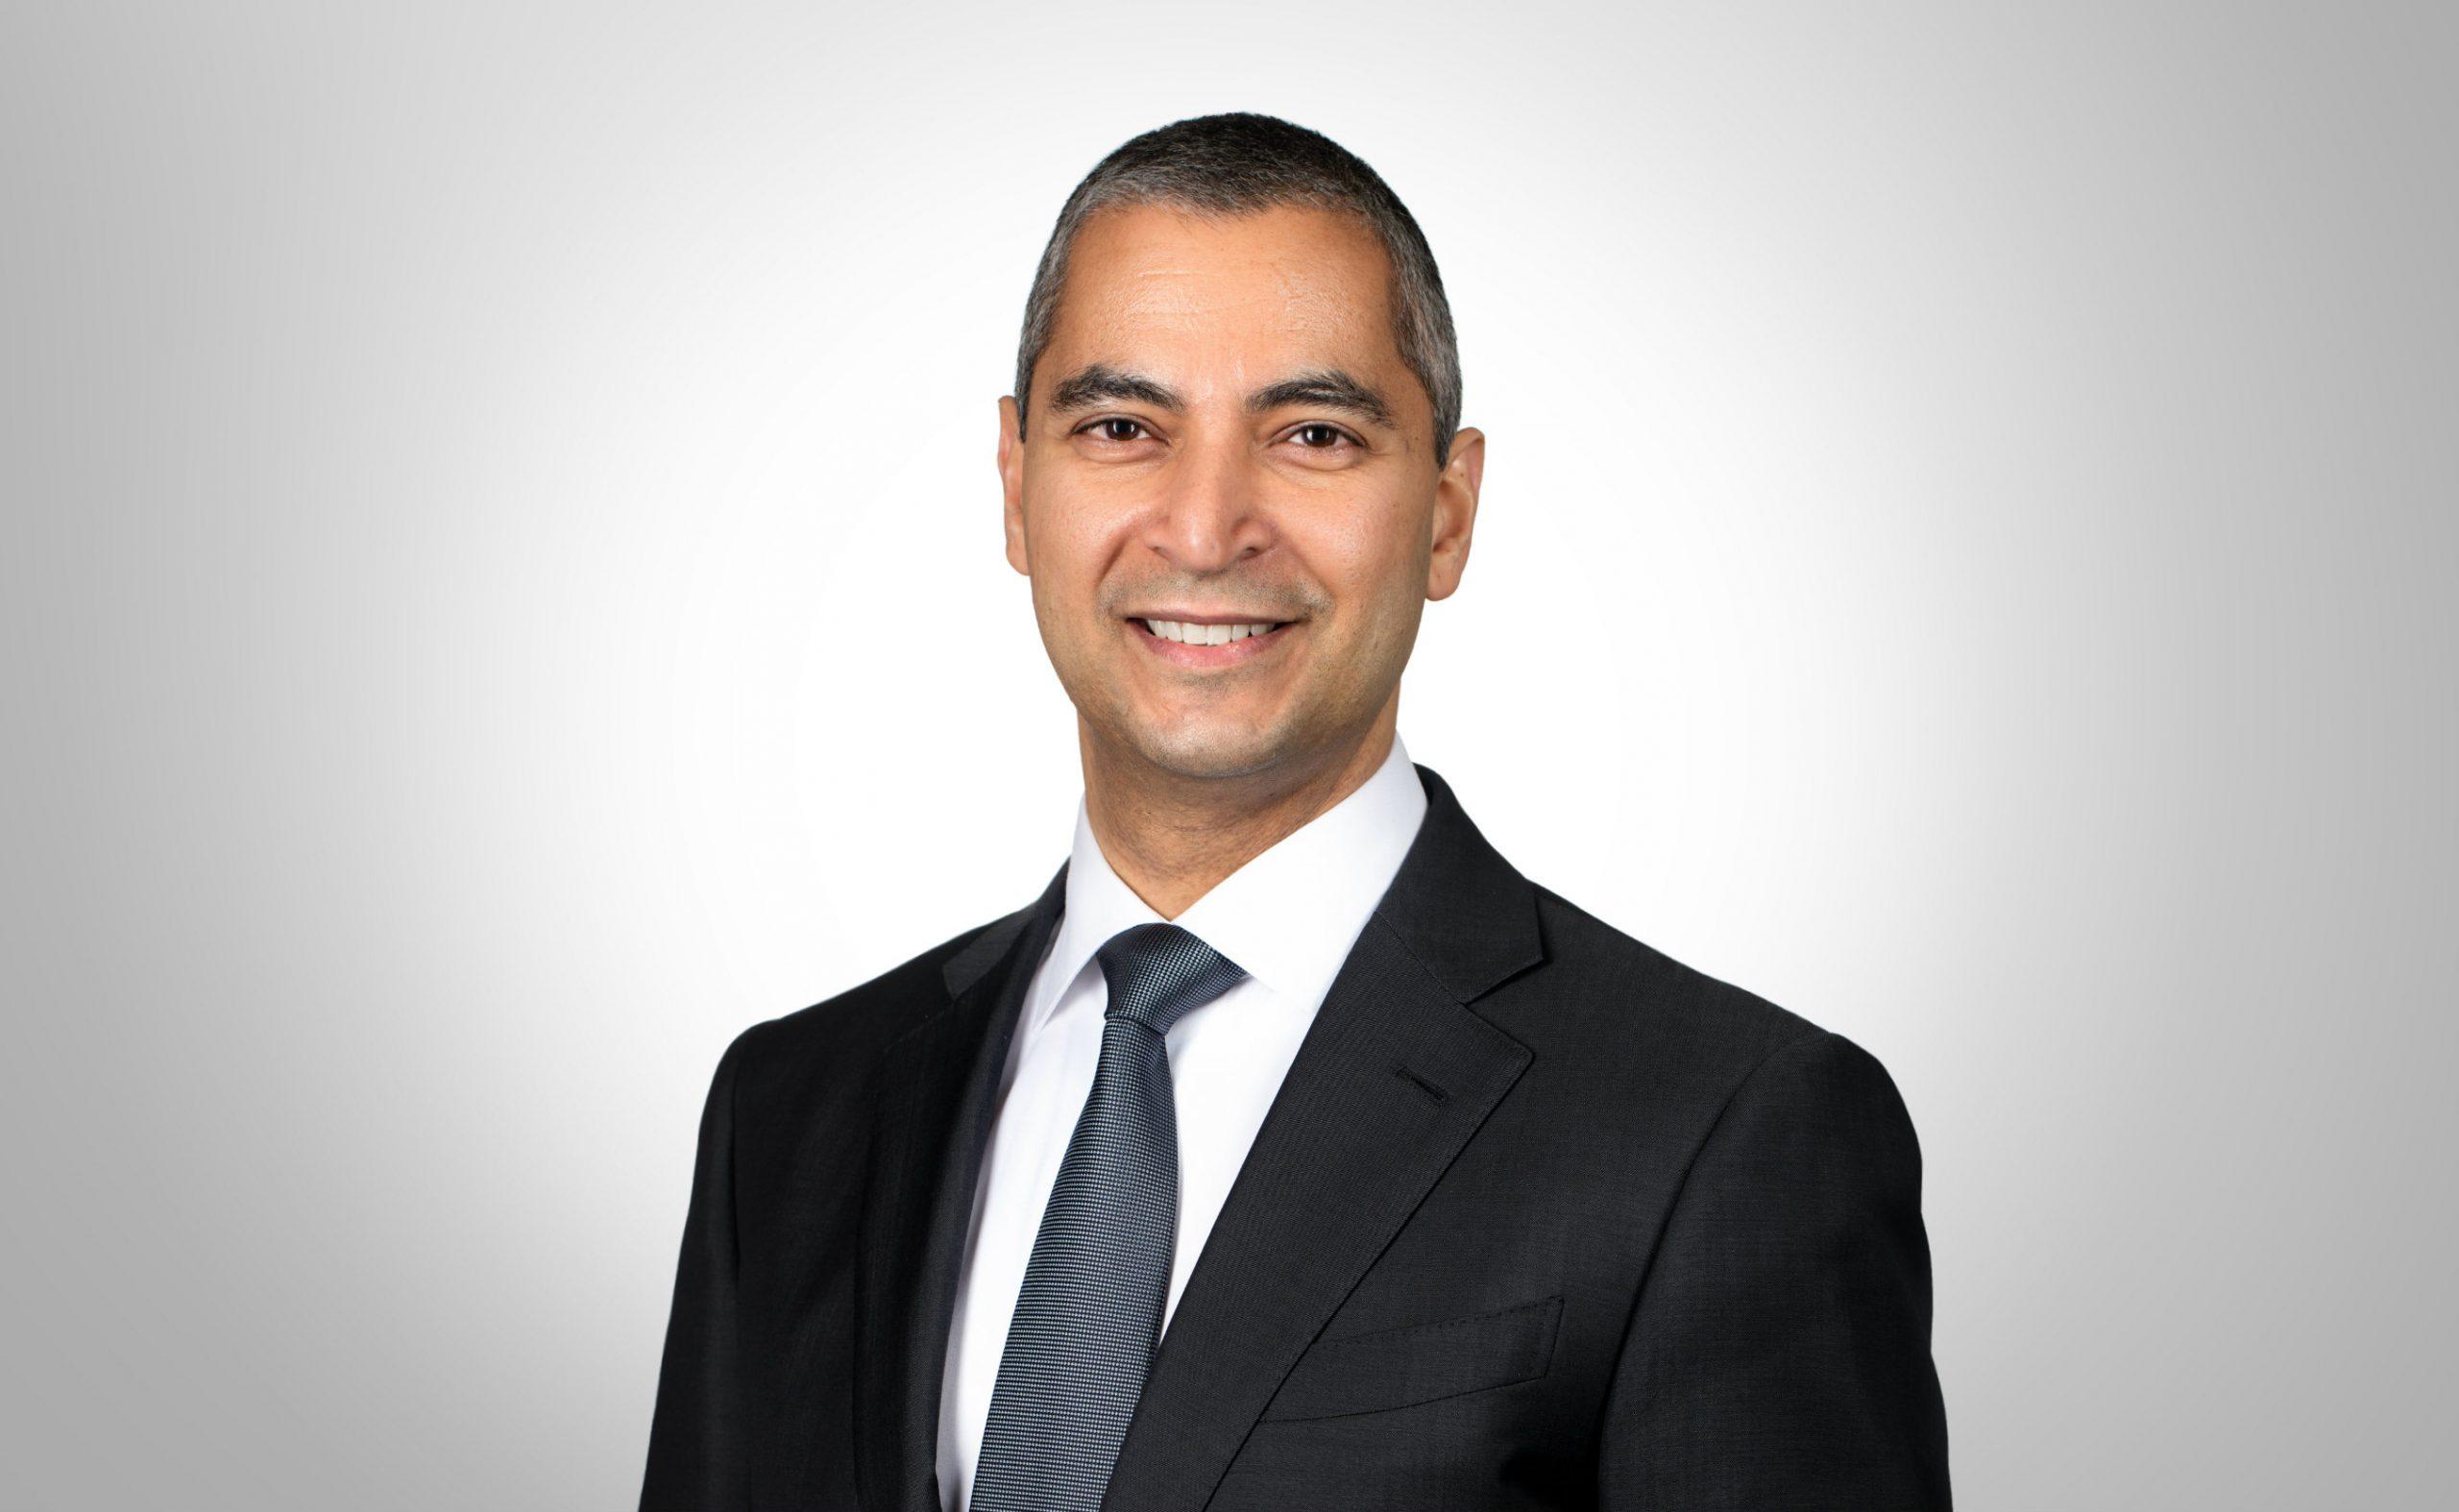 Bahrain EDB appoints Khalid Humaidan as new Chief Executive